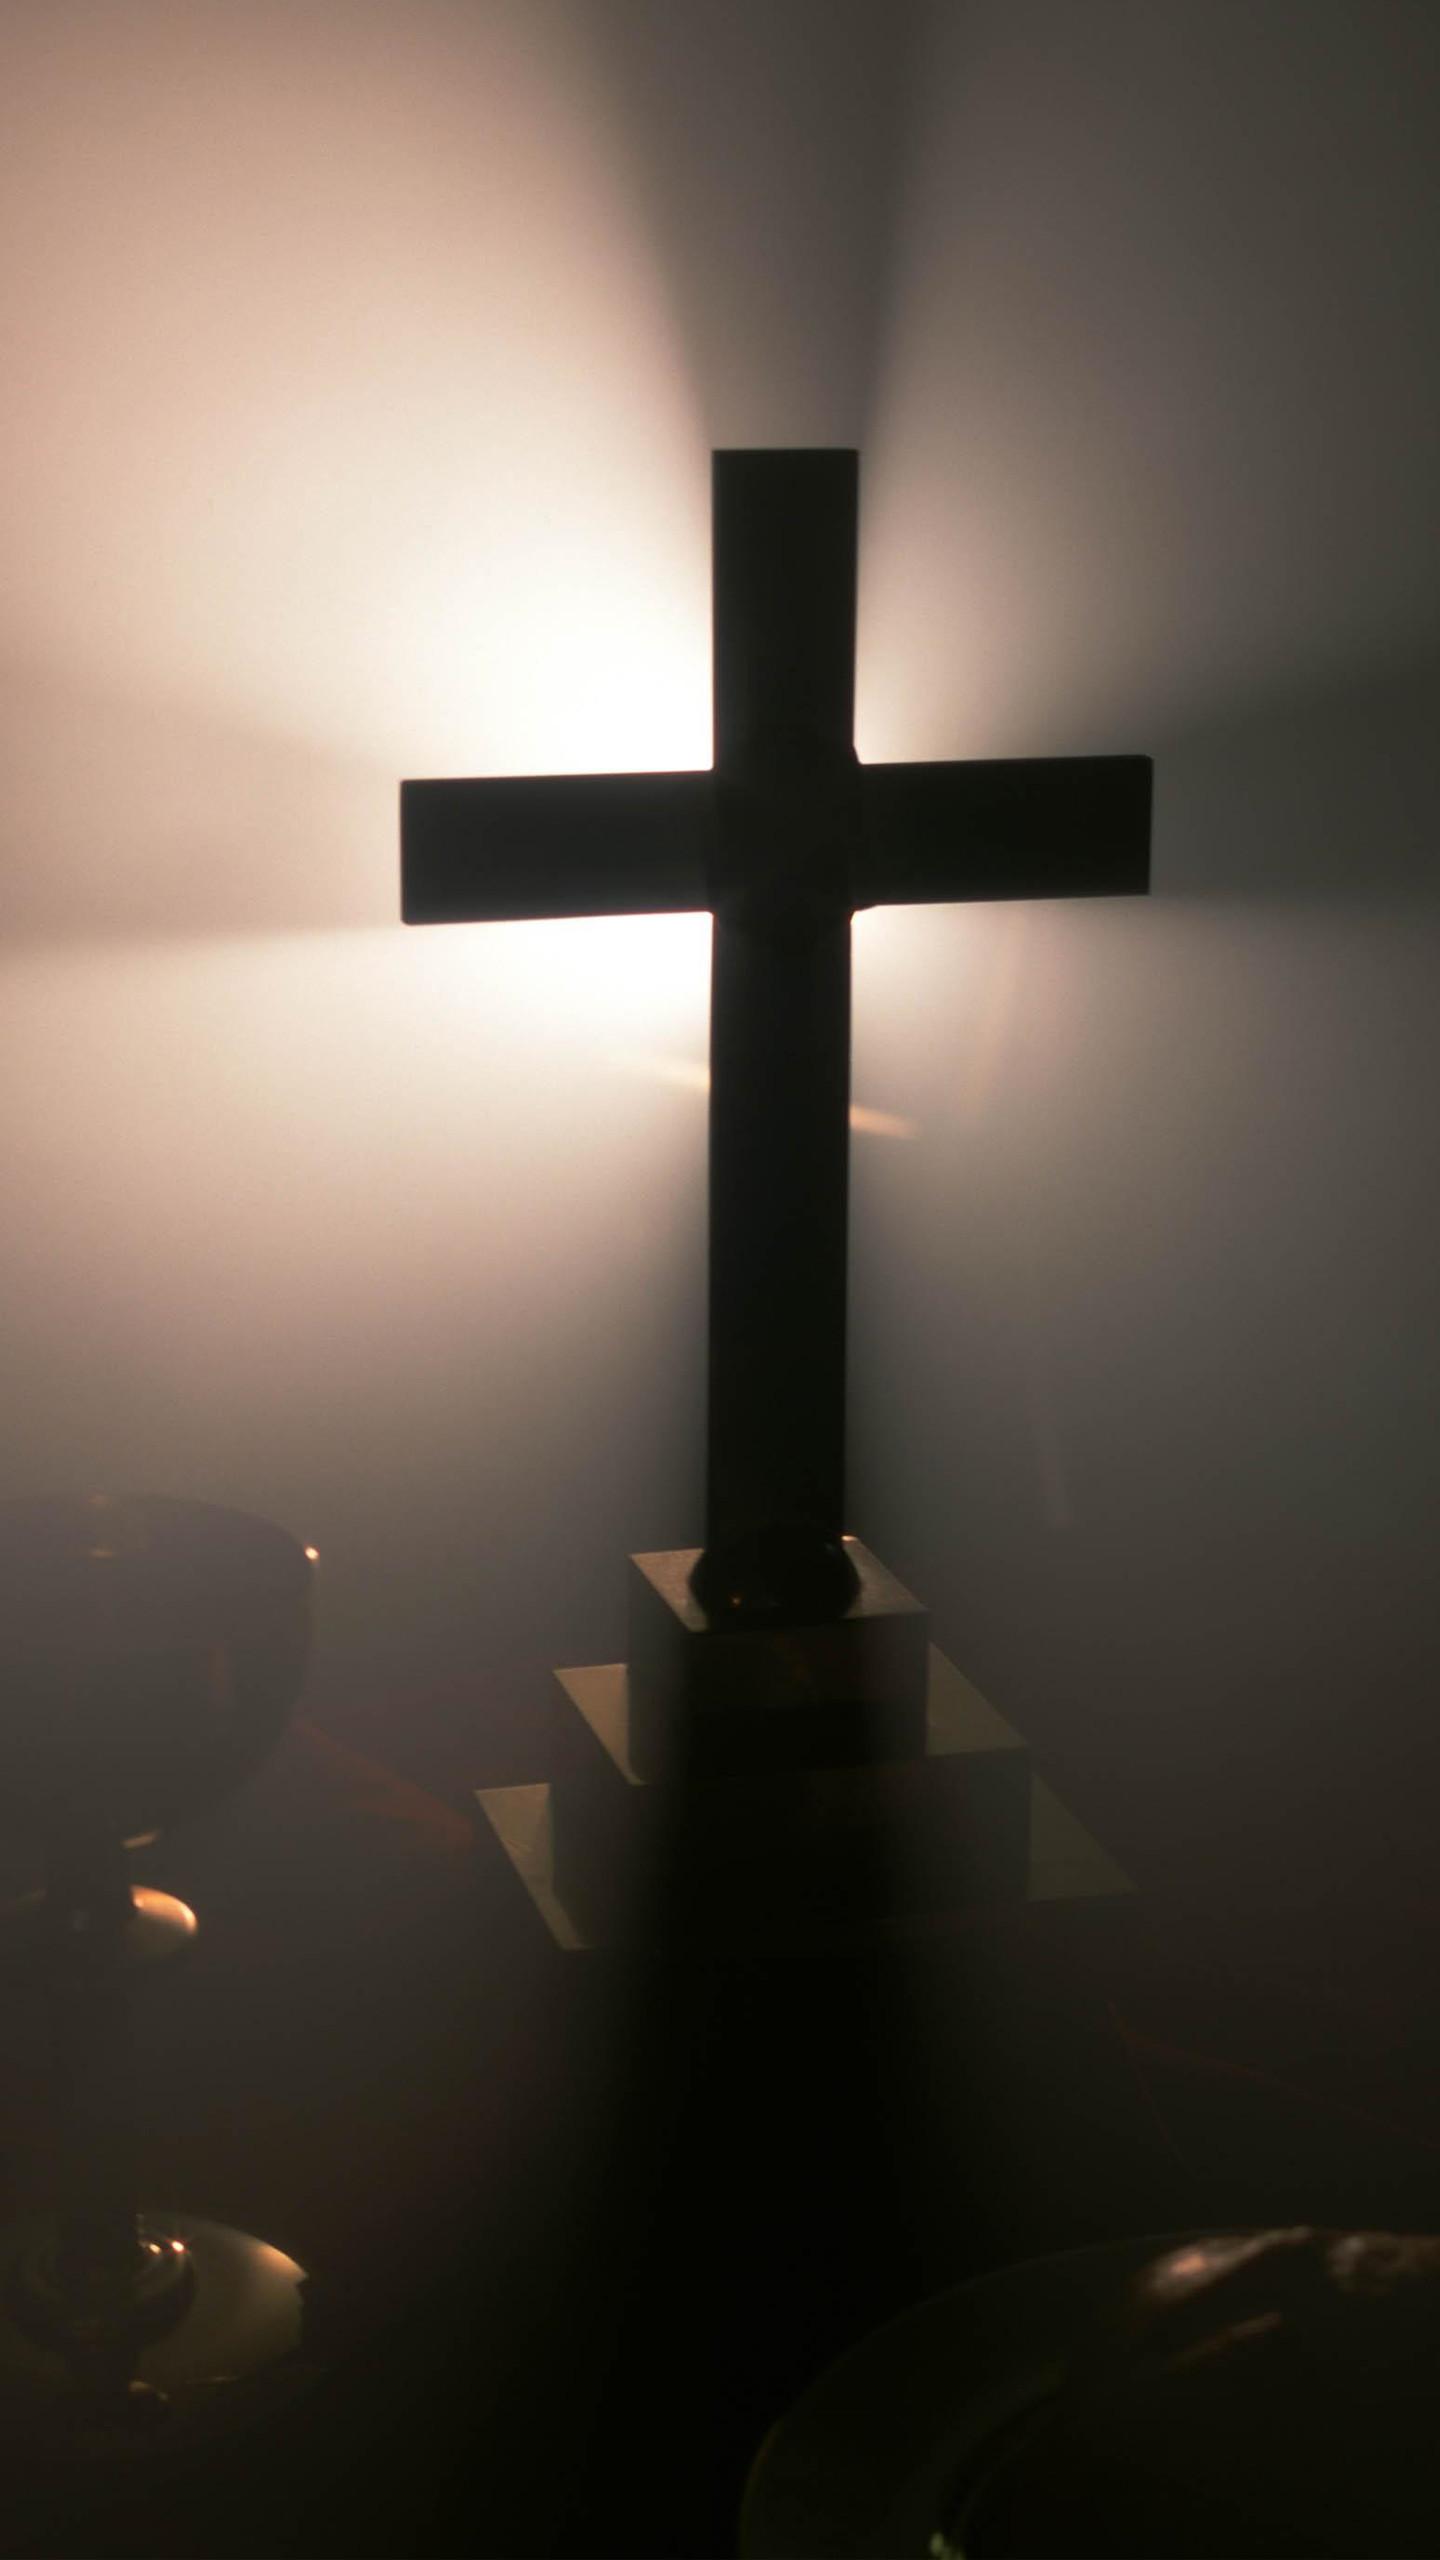 Cross In The Fog Wallpaper